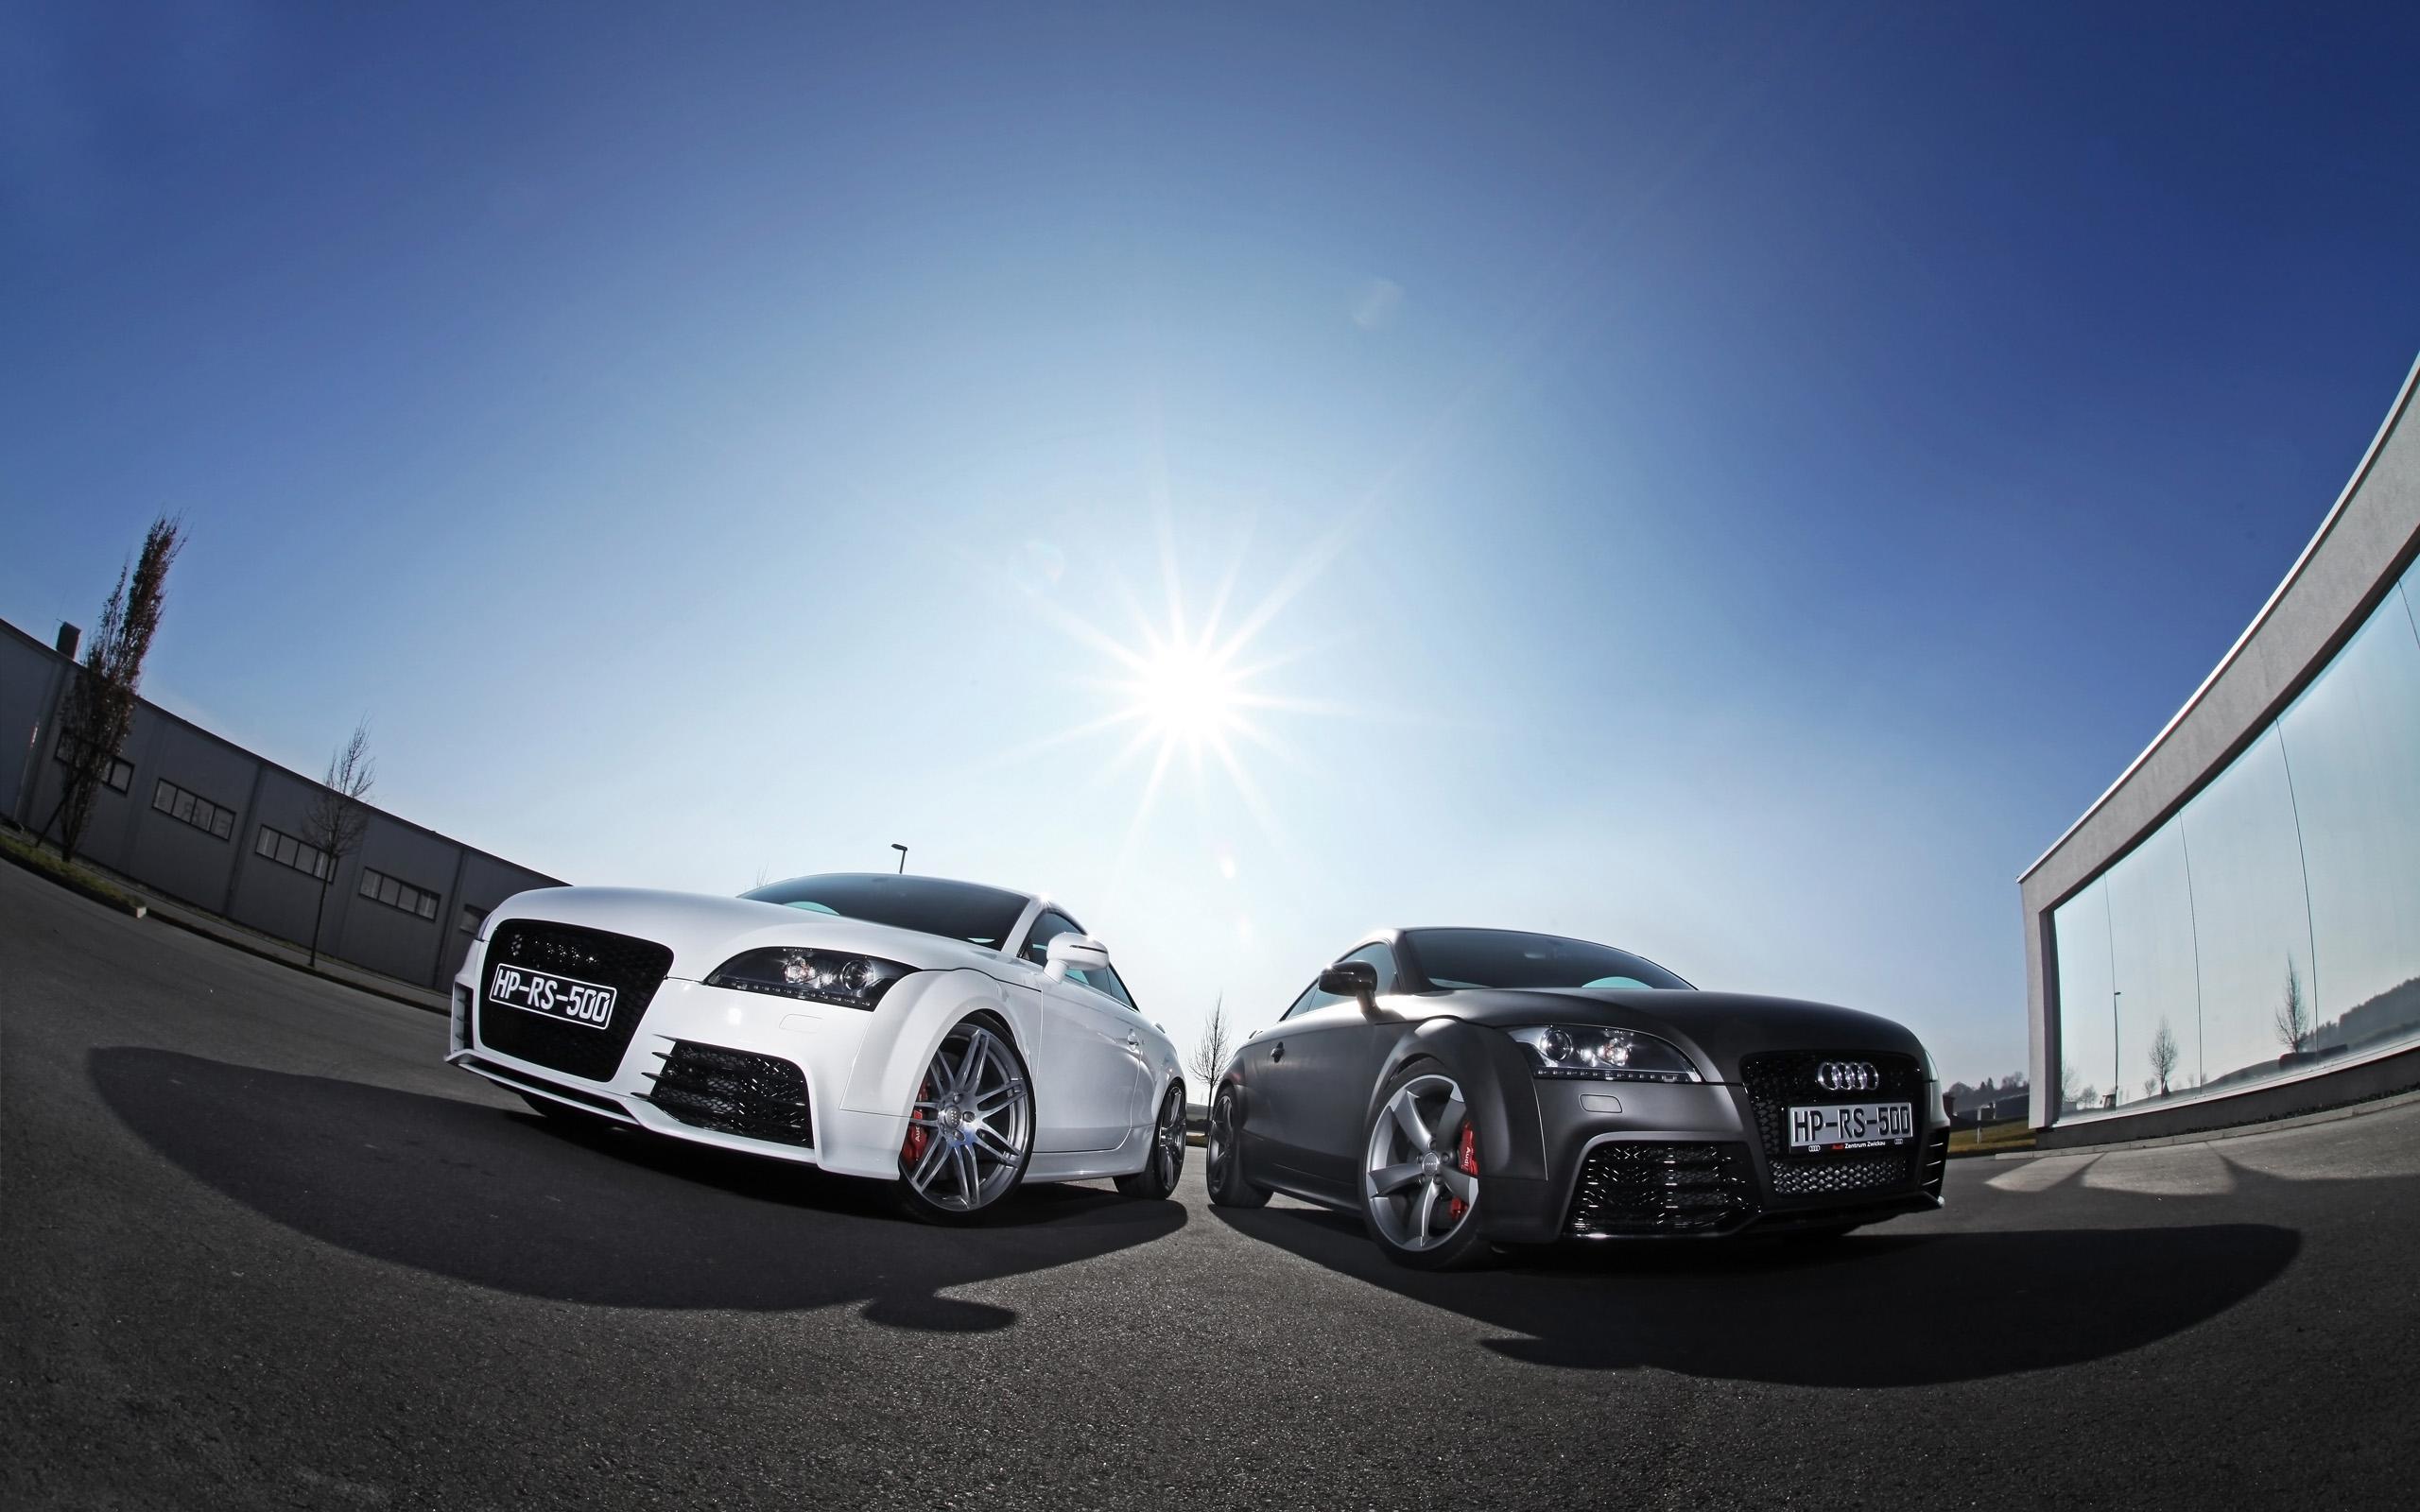 HPerformance Audi TT RS 2014 Wallpaper HD Car Wallpapers 2560x1600